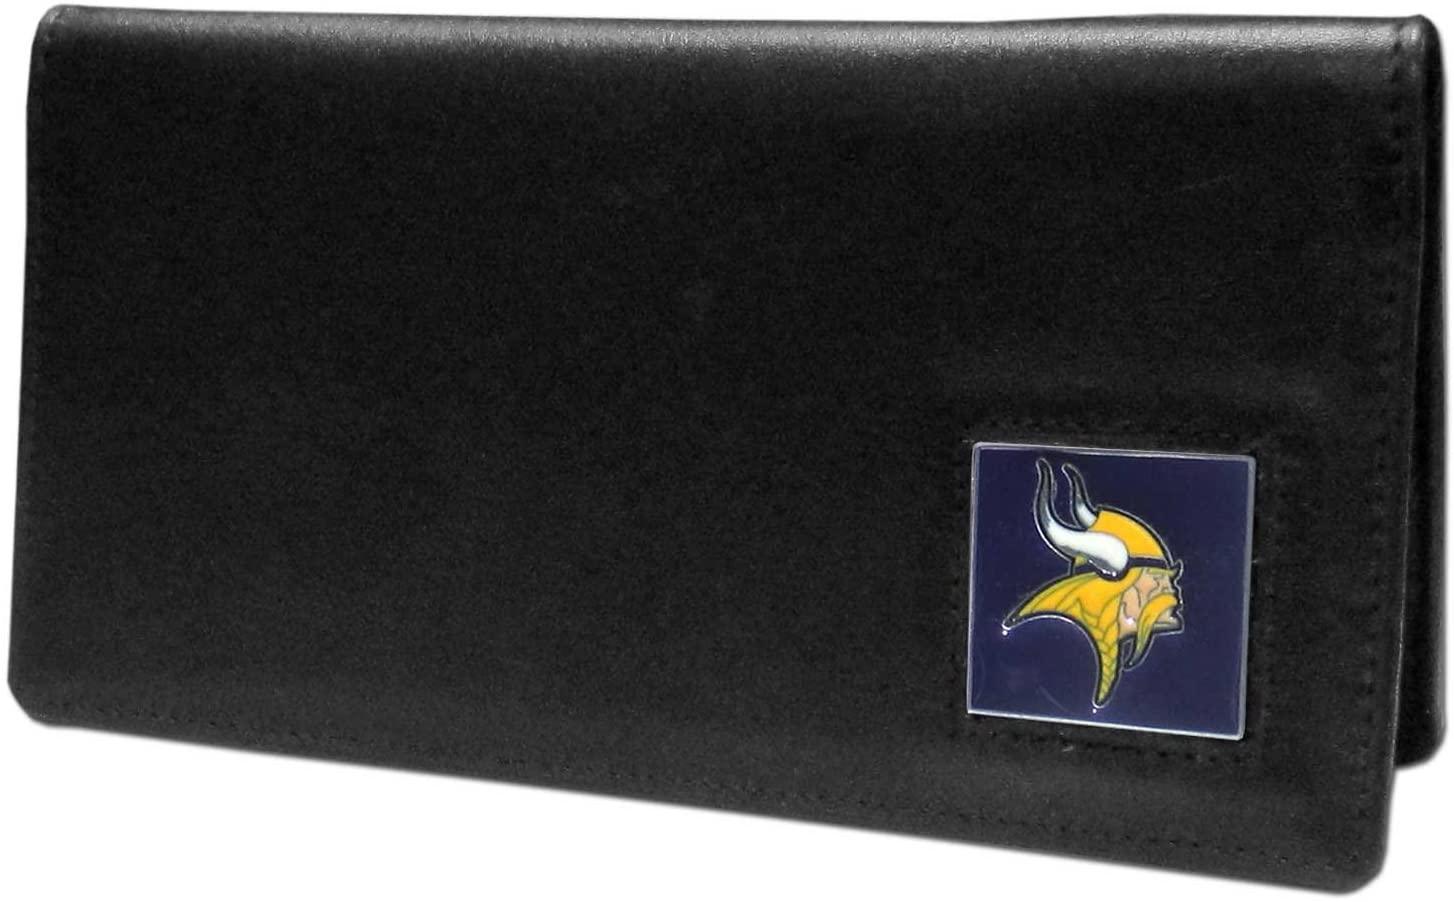 NFL Siskiyou Sports Fan Shop Minnesota Vikings Leather Checkbook Cover One Size Black